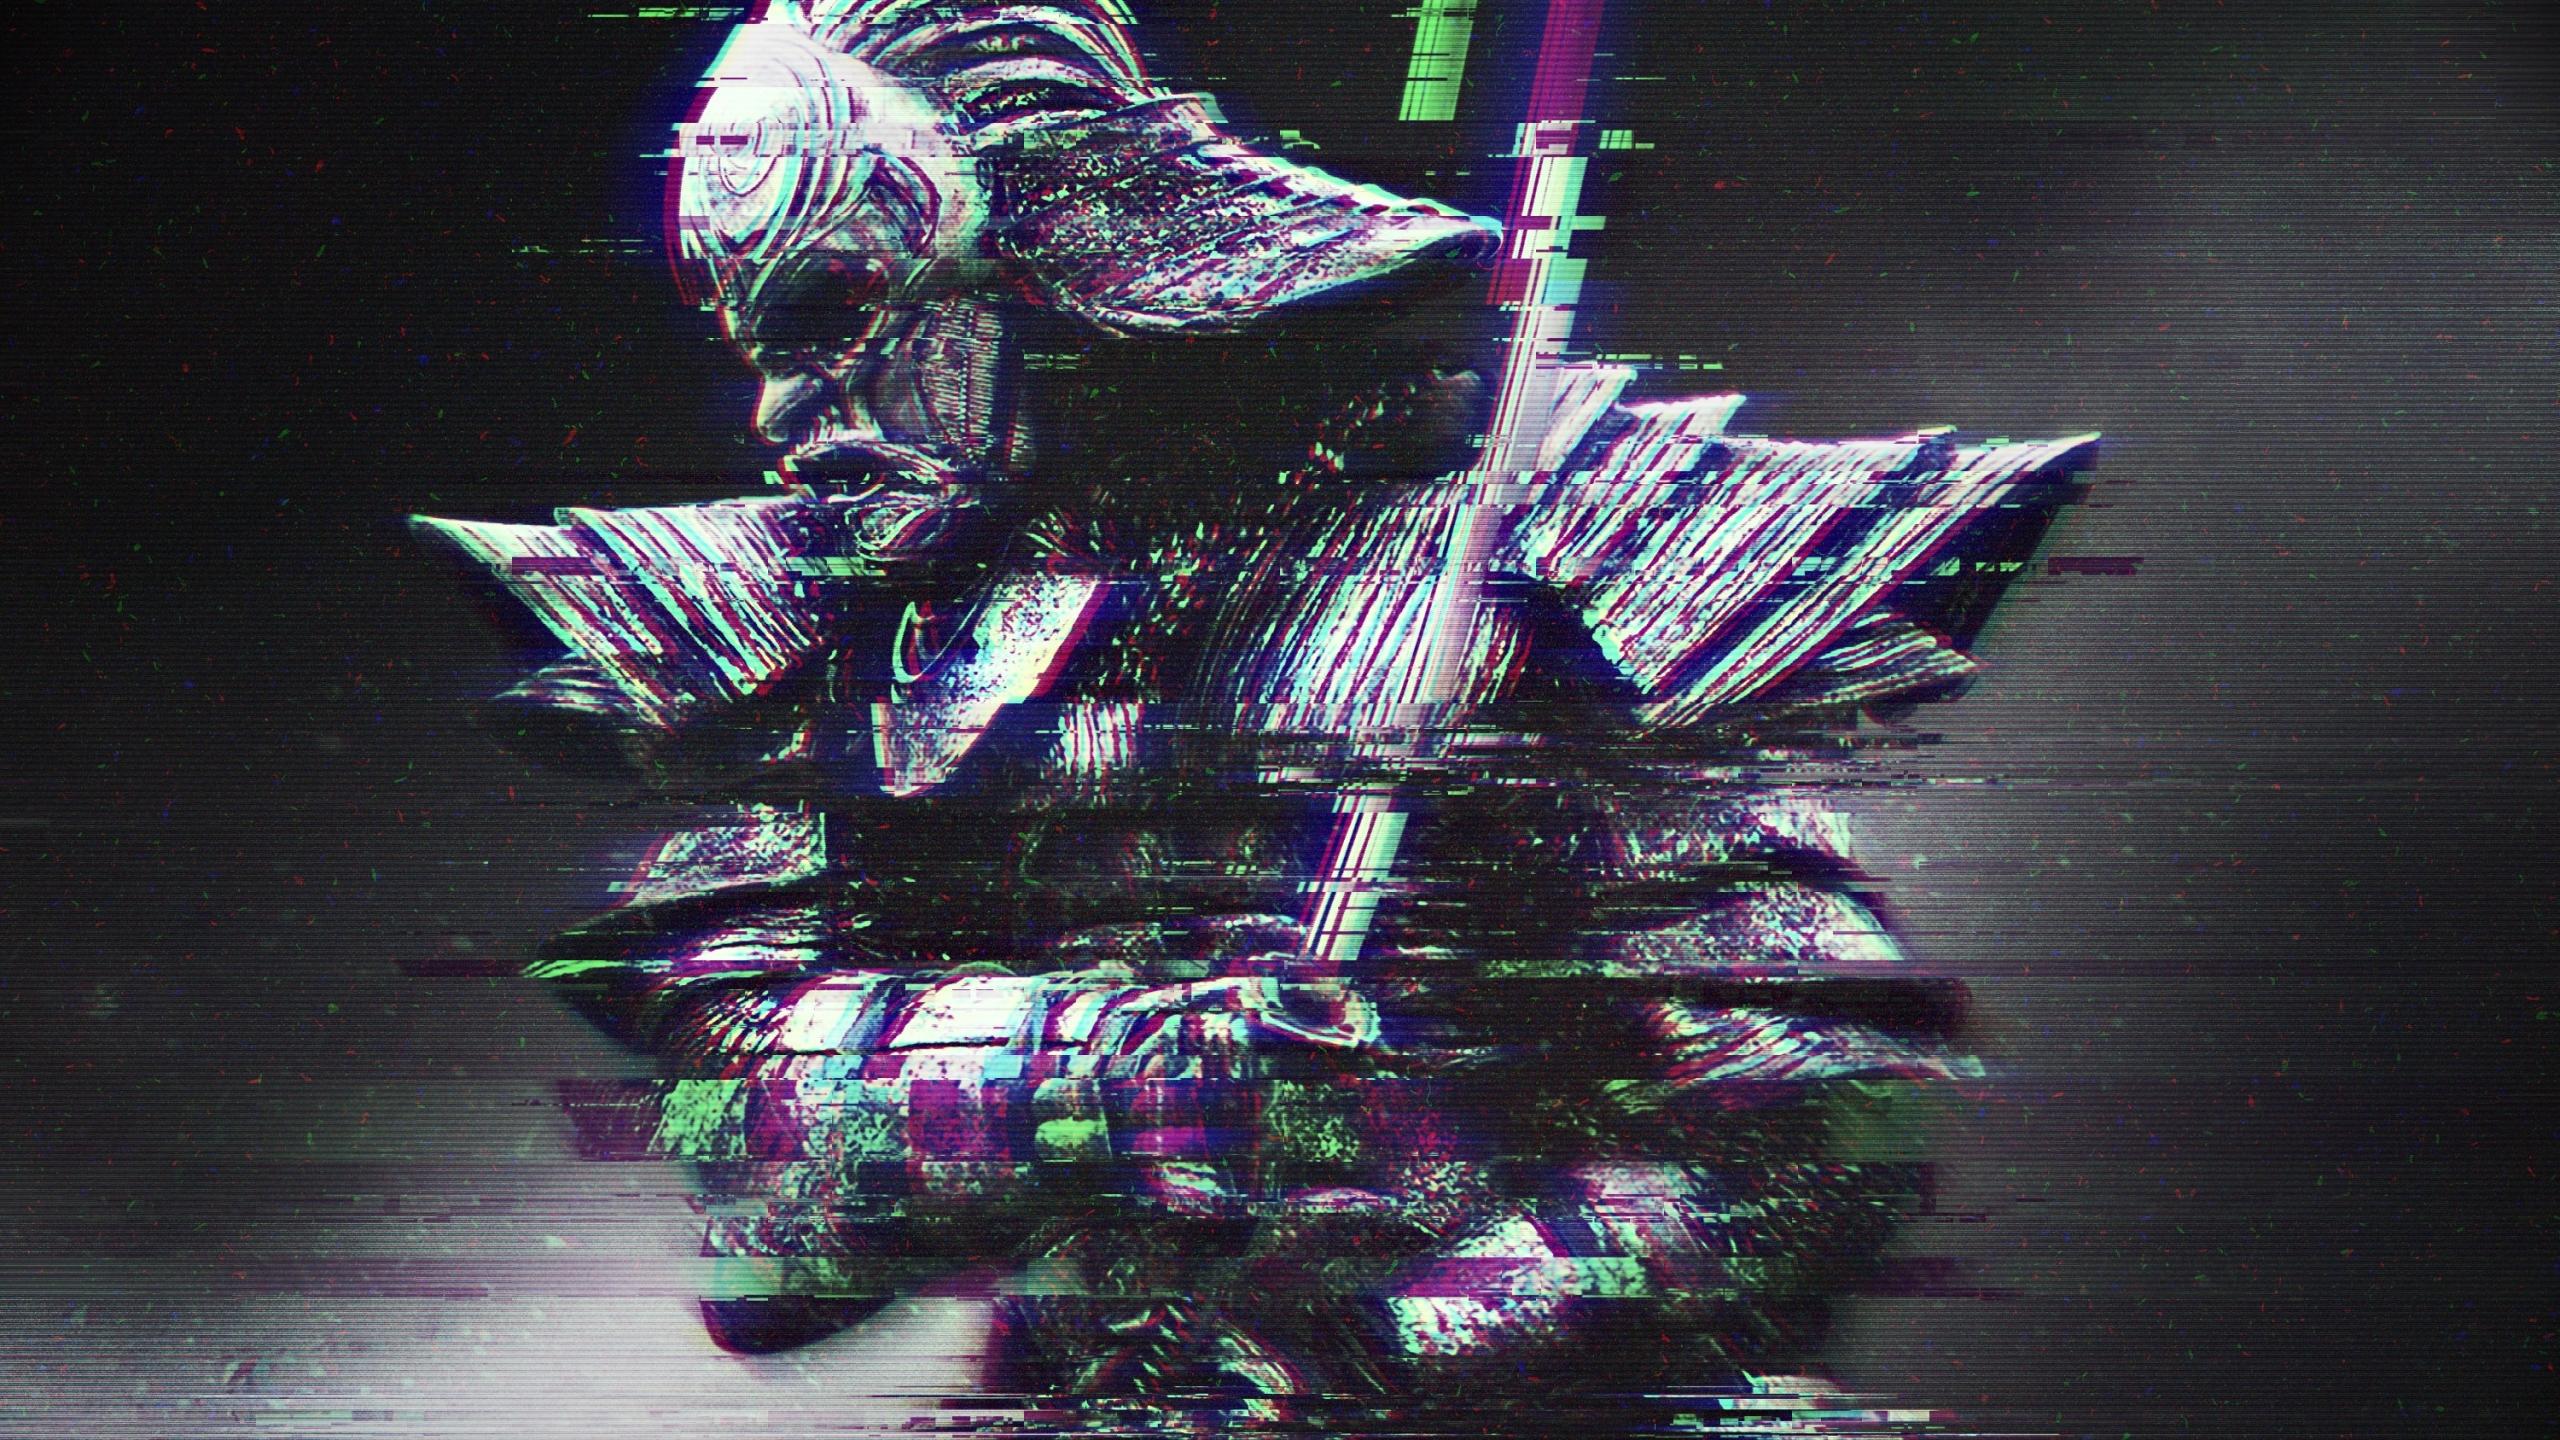 Samurai Youtube Channel Art - HD Wallpaper